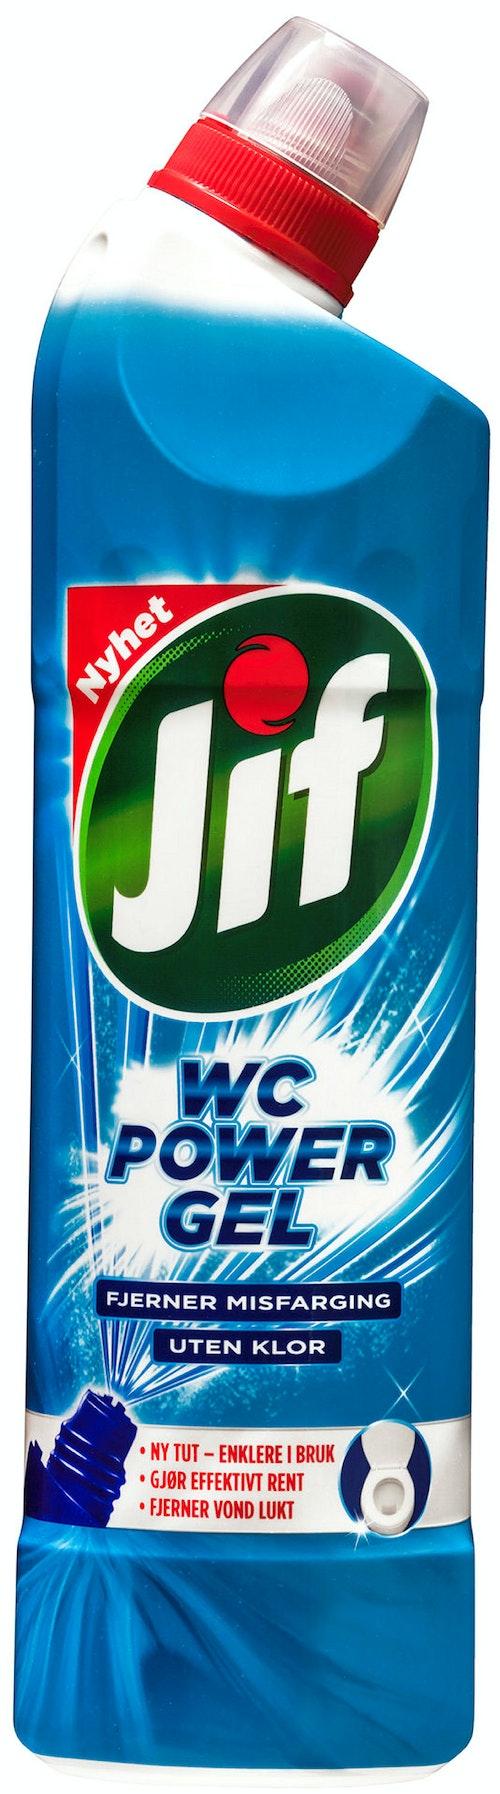 Jif Jif Wc Power Gel Uten Klor 750 ml